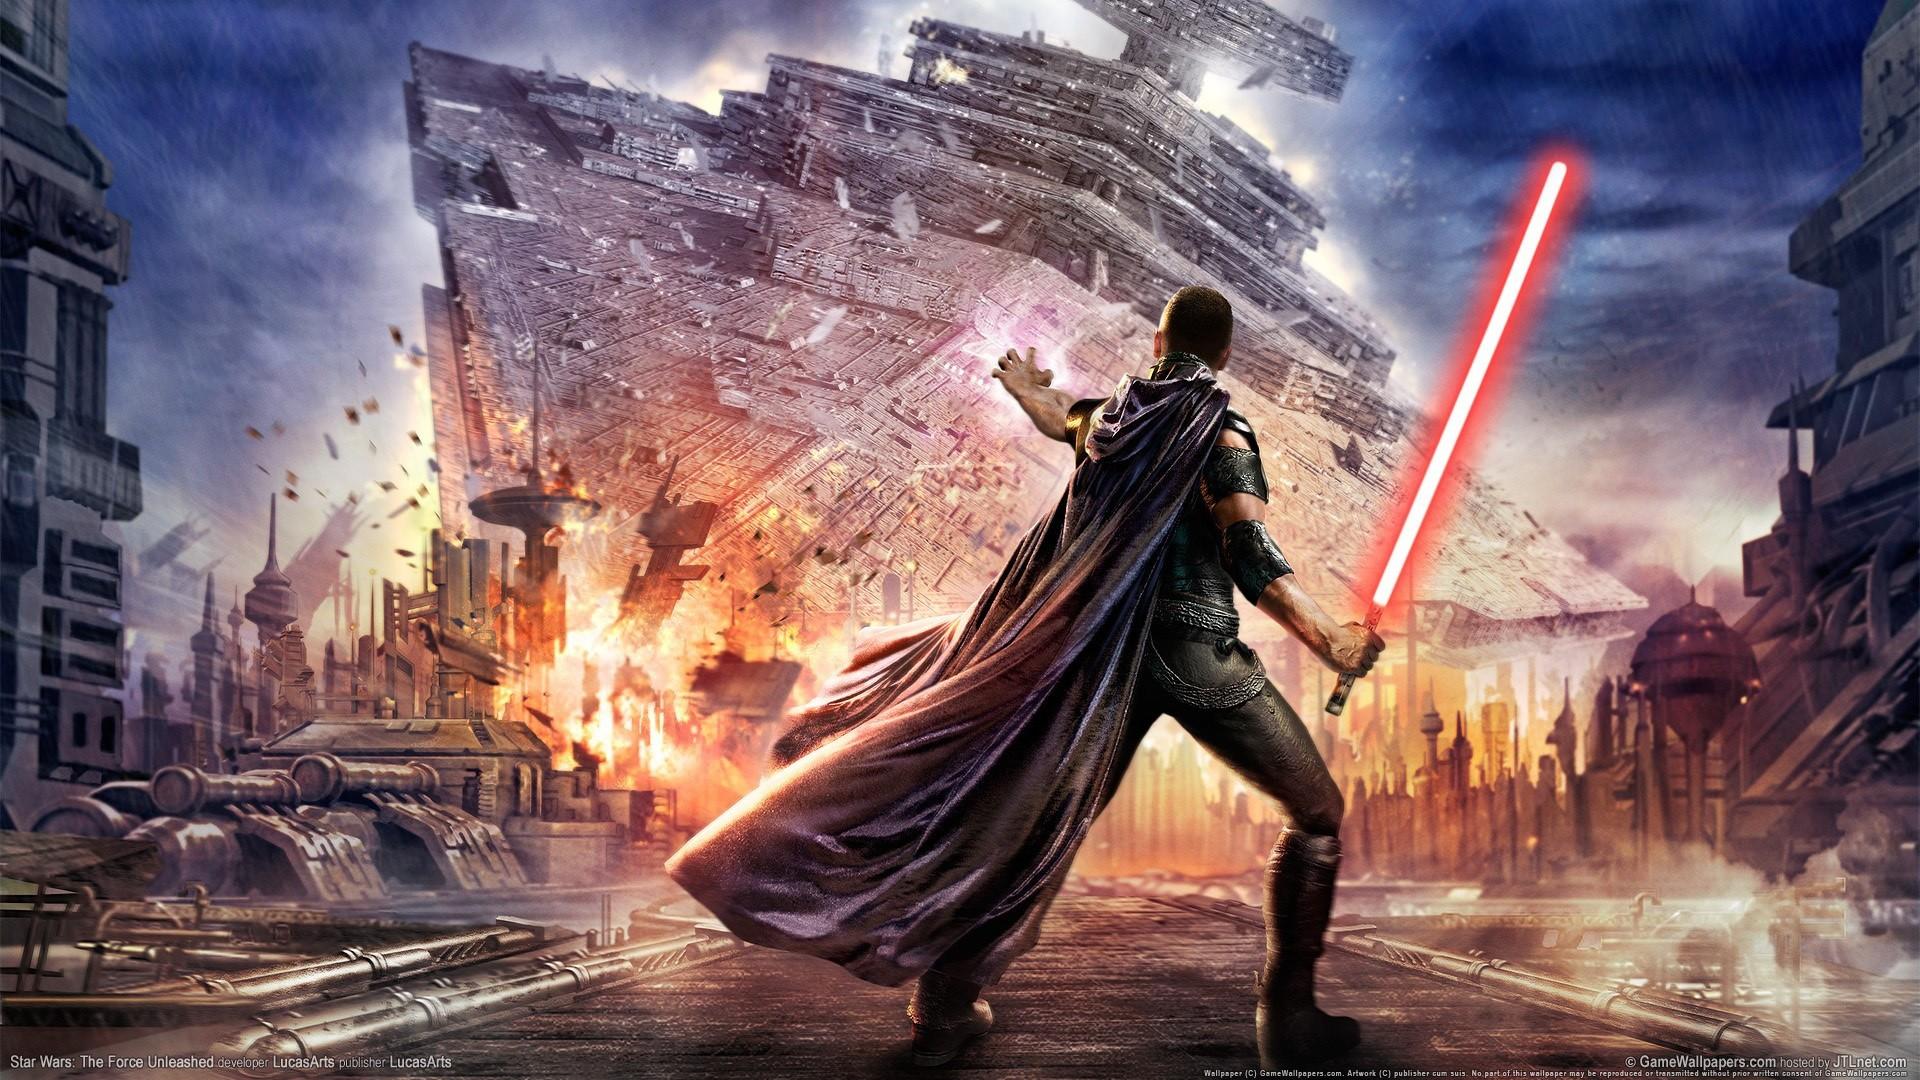 Wallpaper star wars, the force unleashed, lightsaber